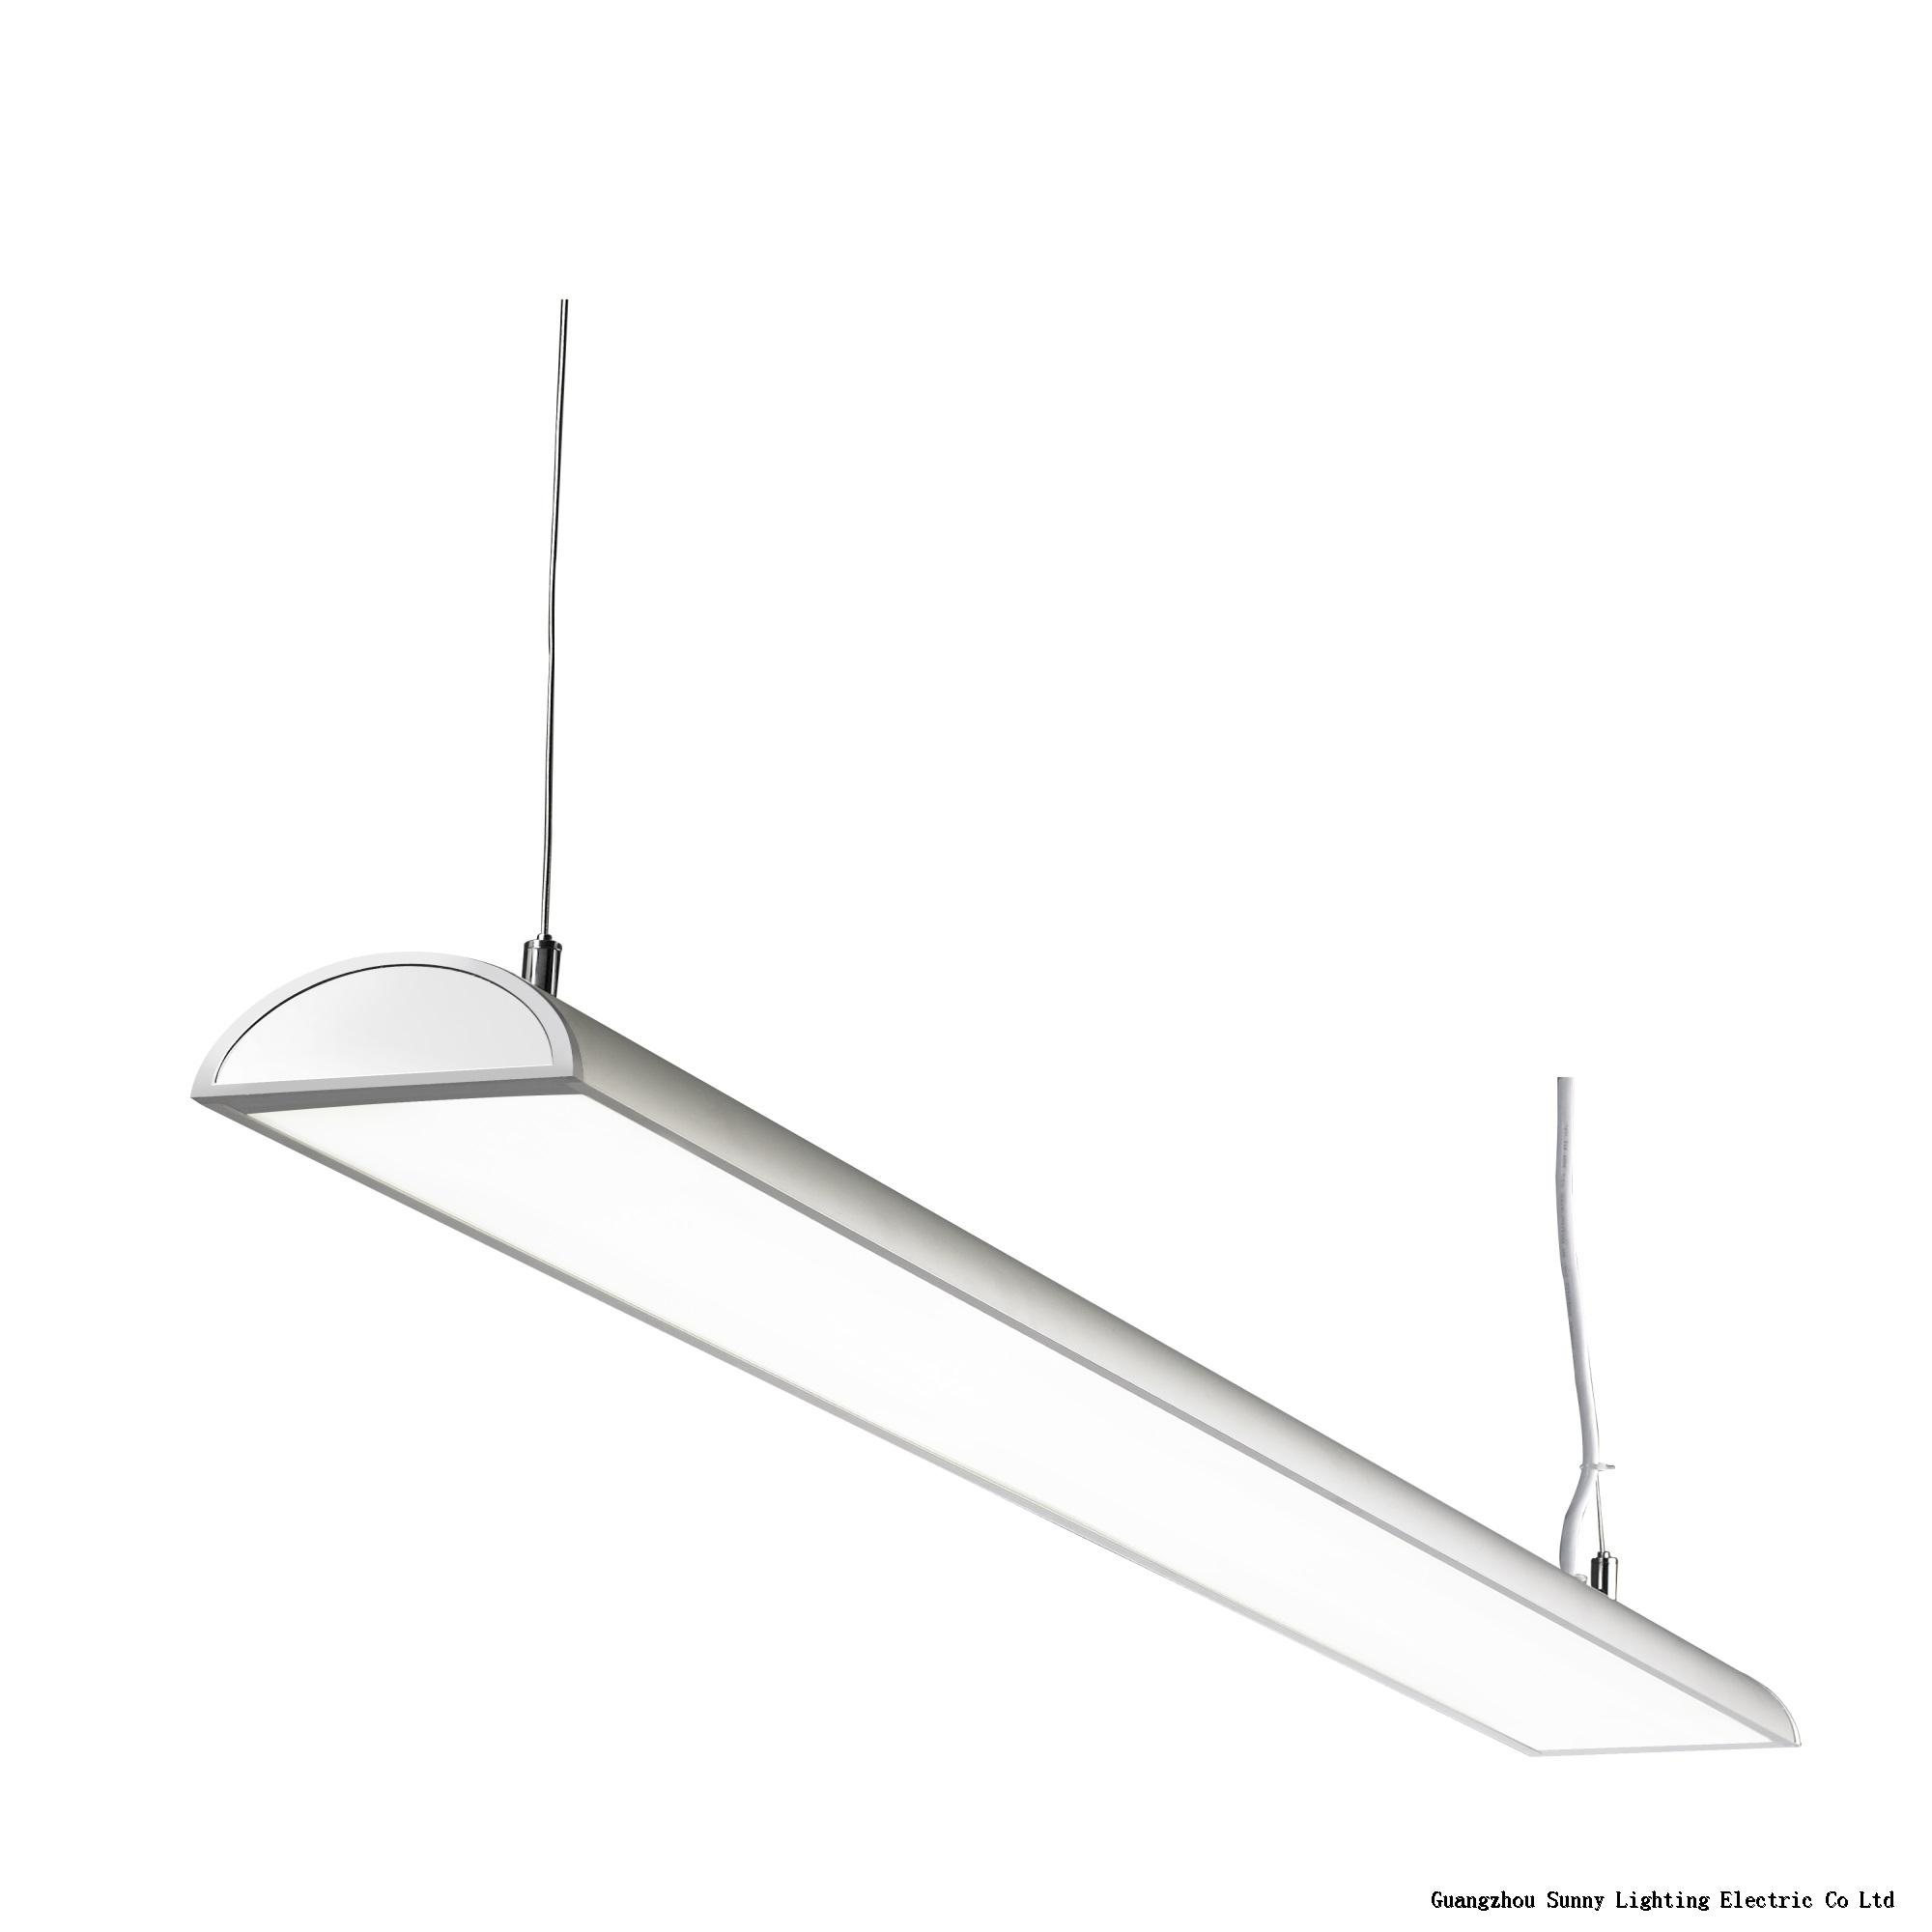 LED Arc Downward Light